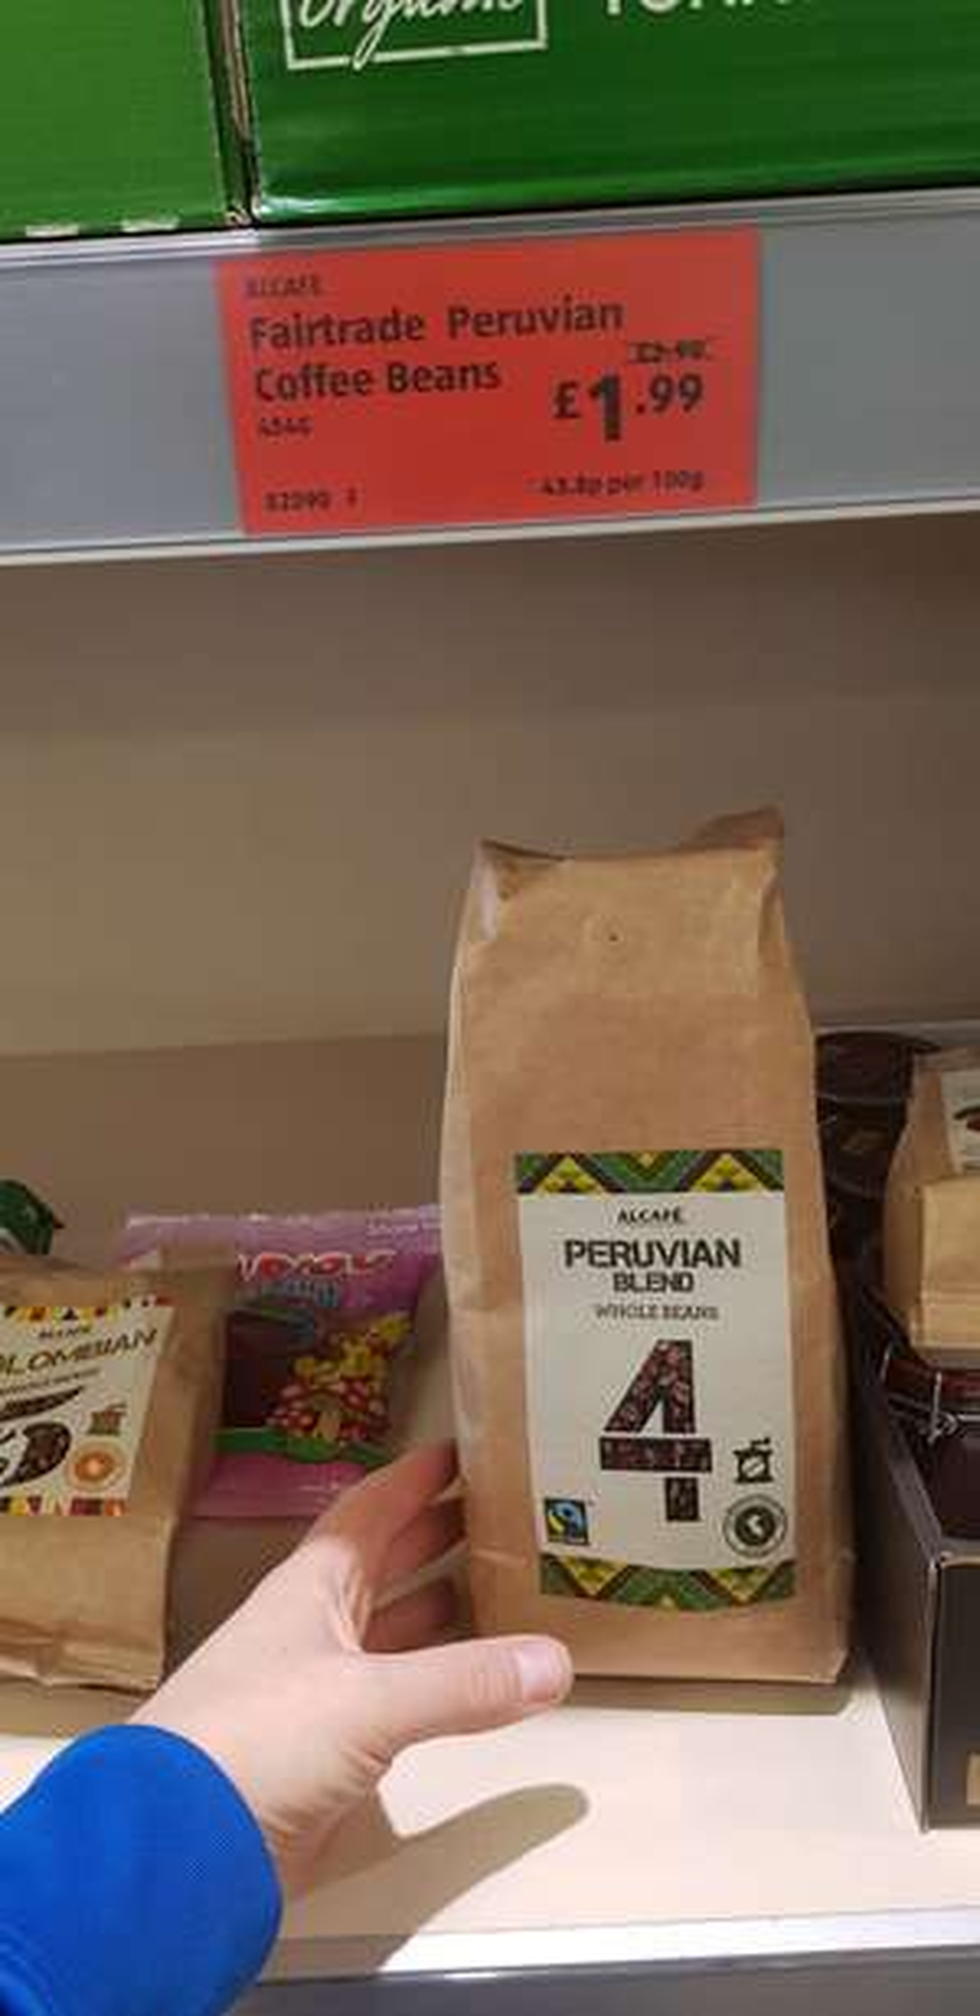 Aldi fair trade Peruvian coffee beans 454gr instore for £1.99